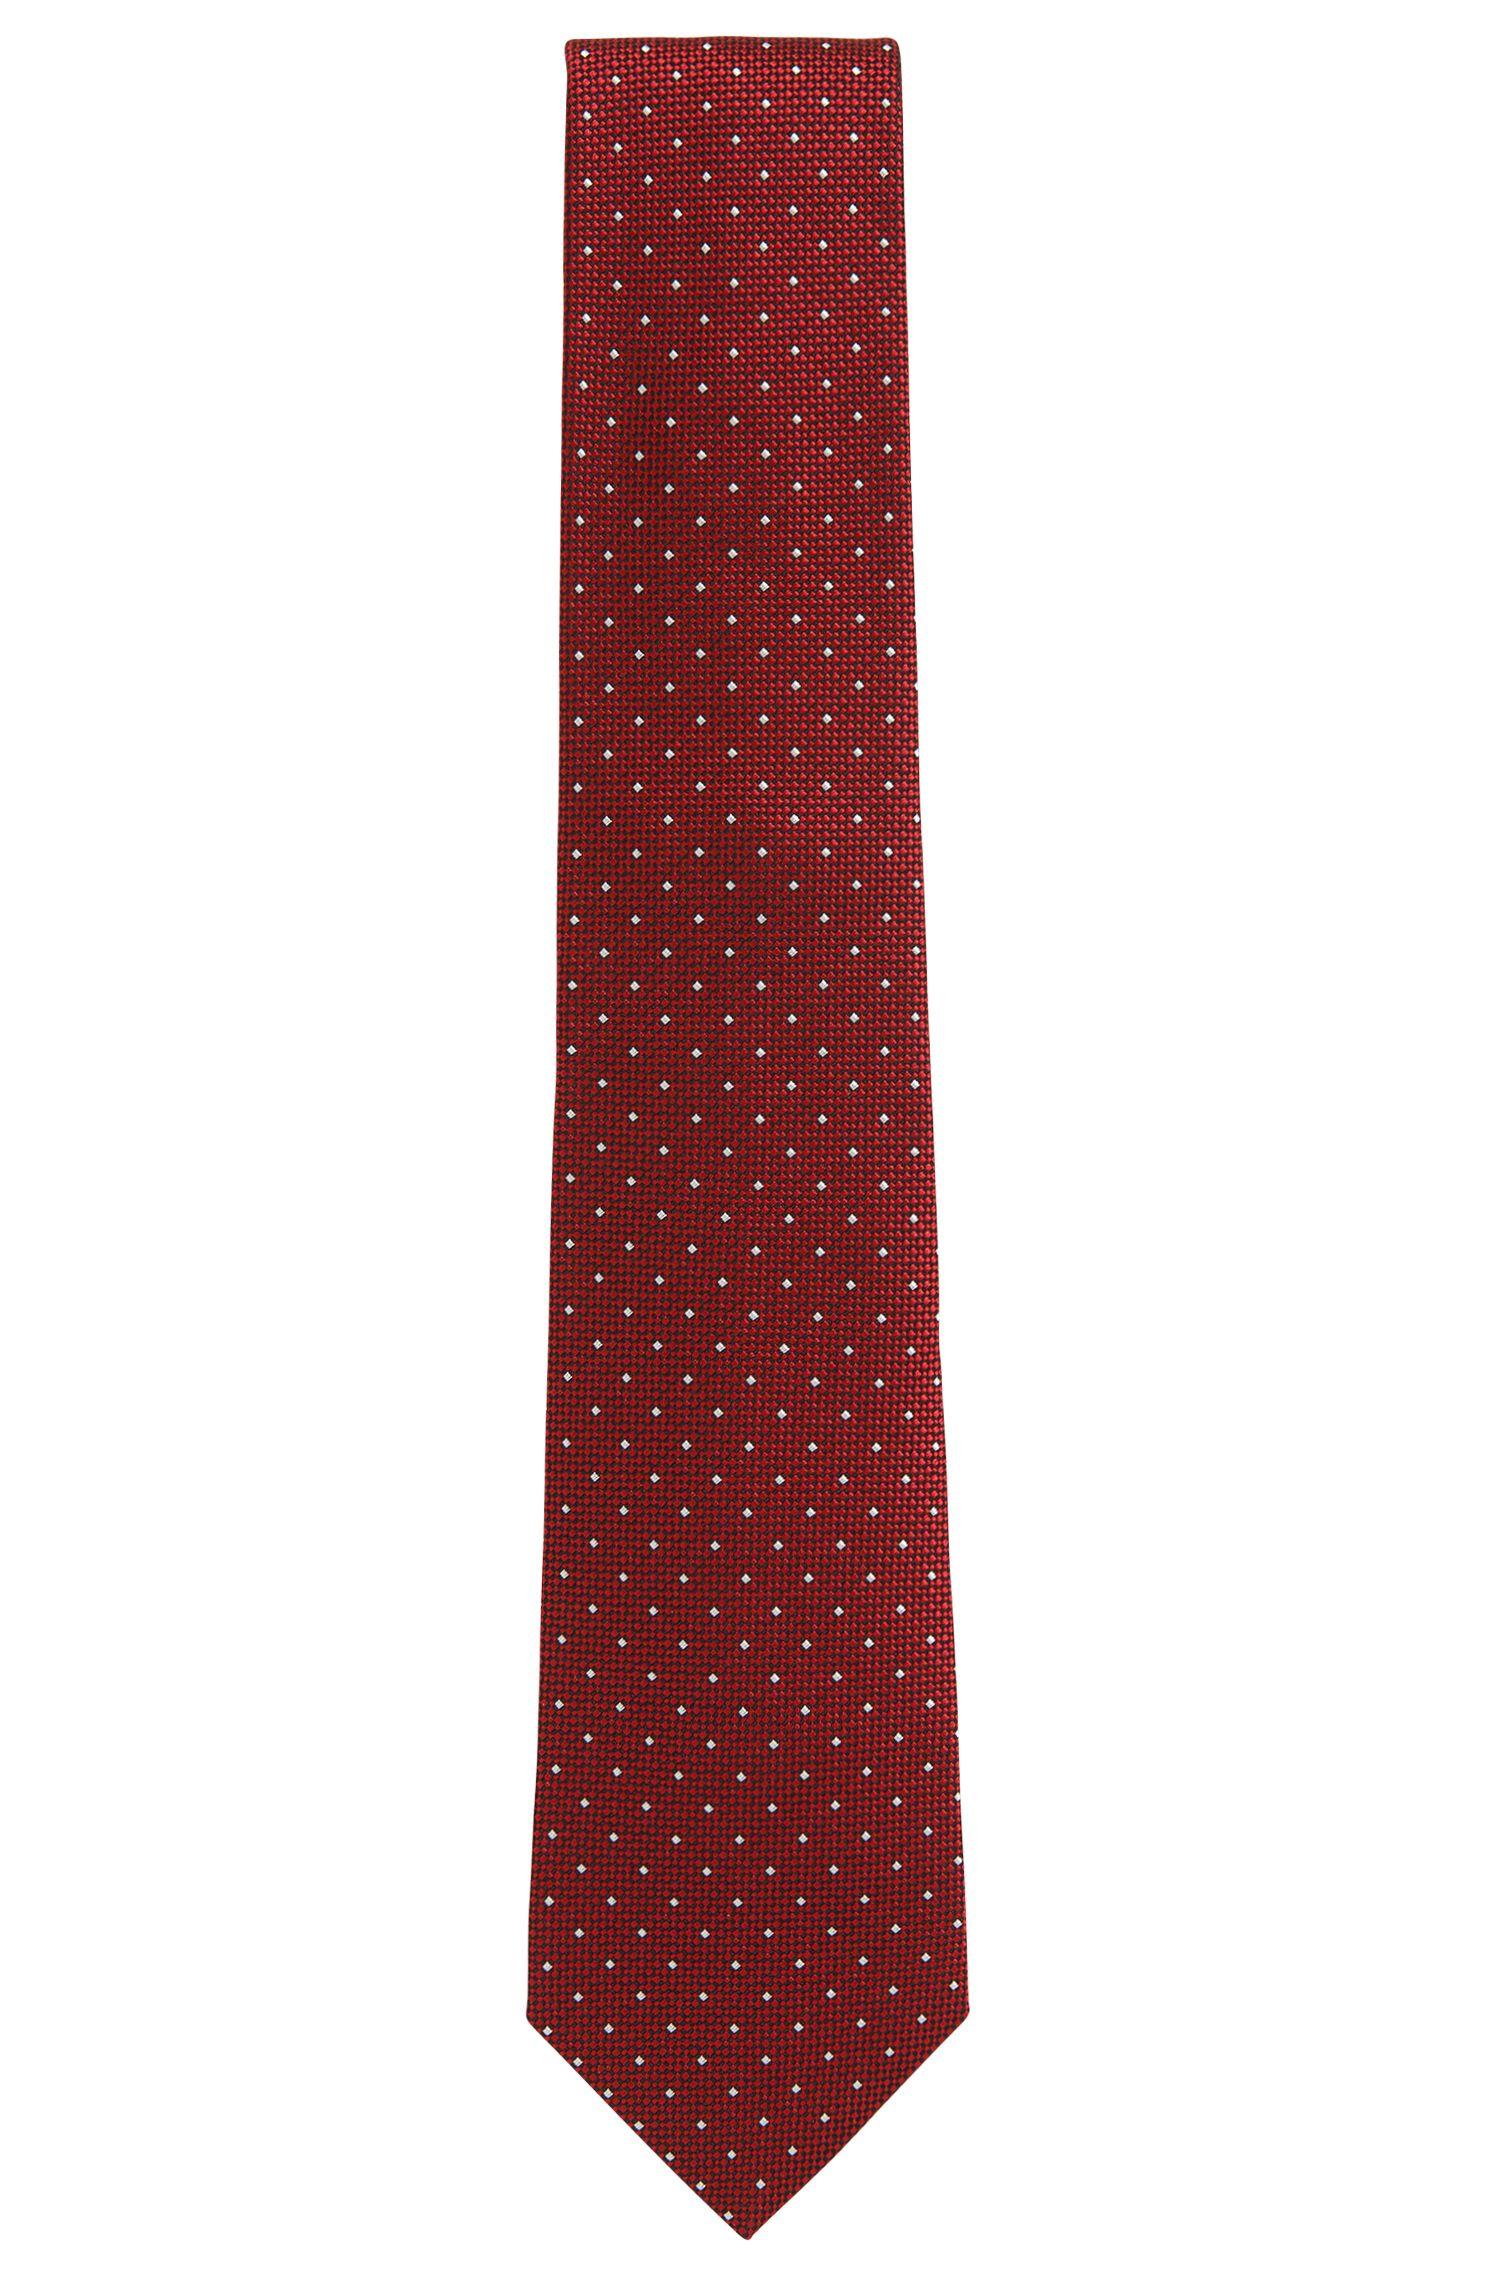 BOSS Tailored Polka Dot Dobby Italian Silk Tie, Red